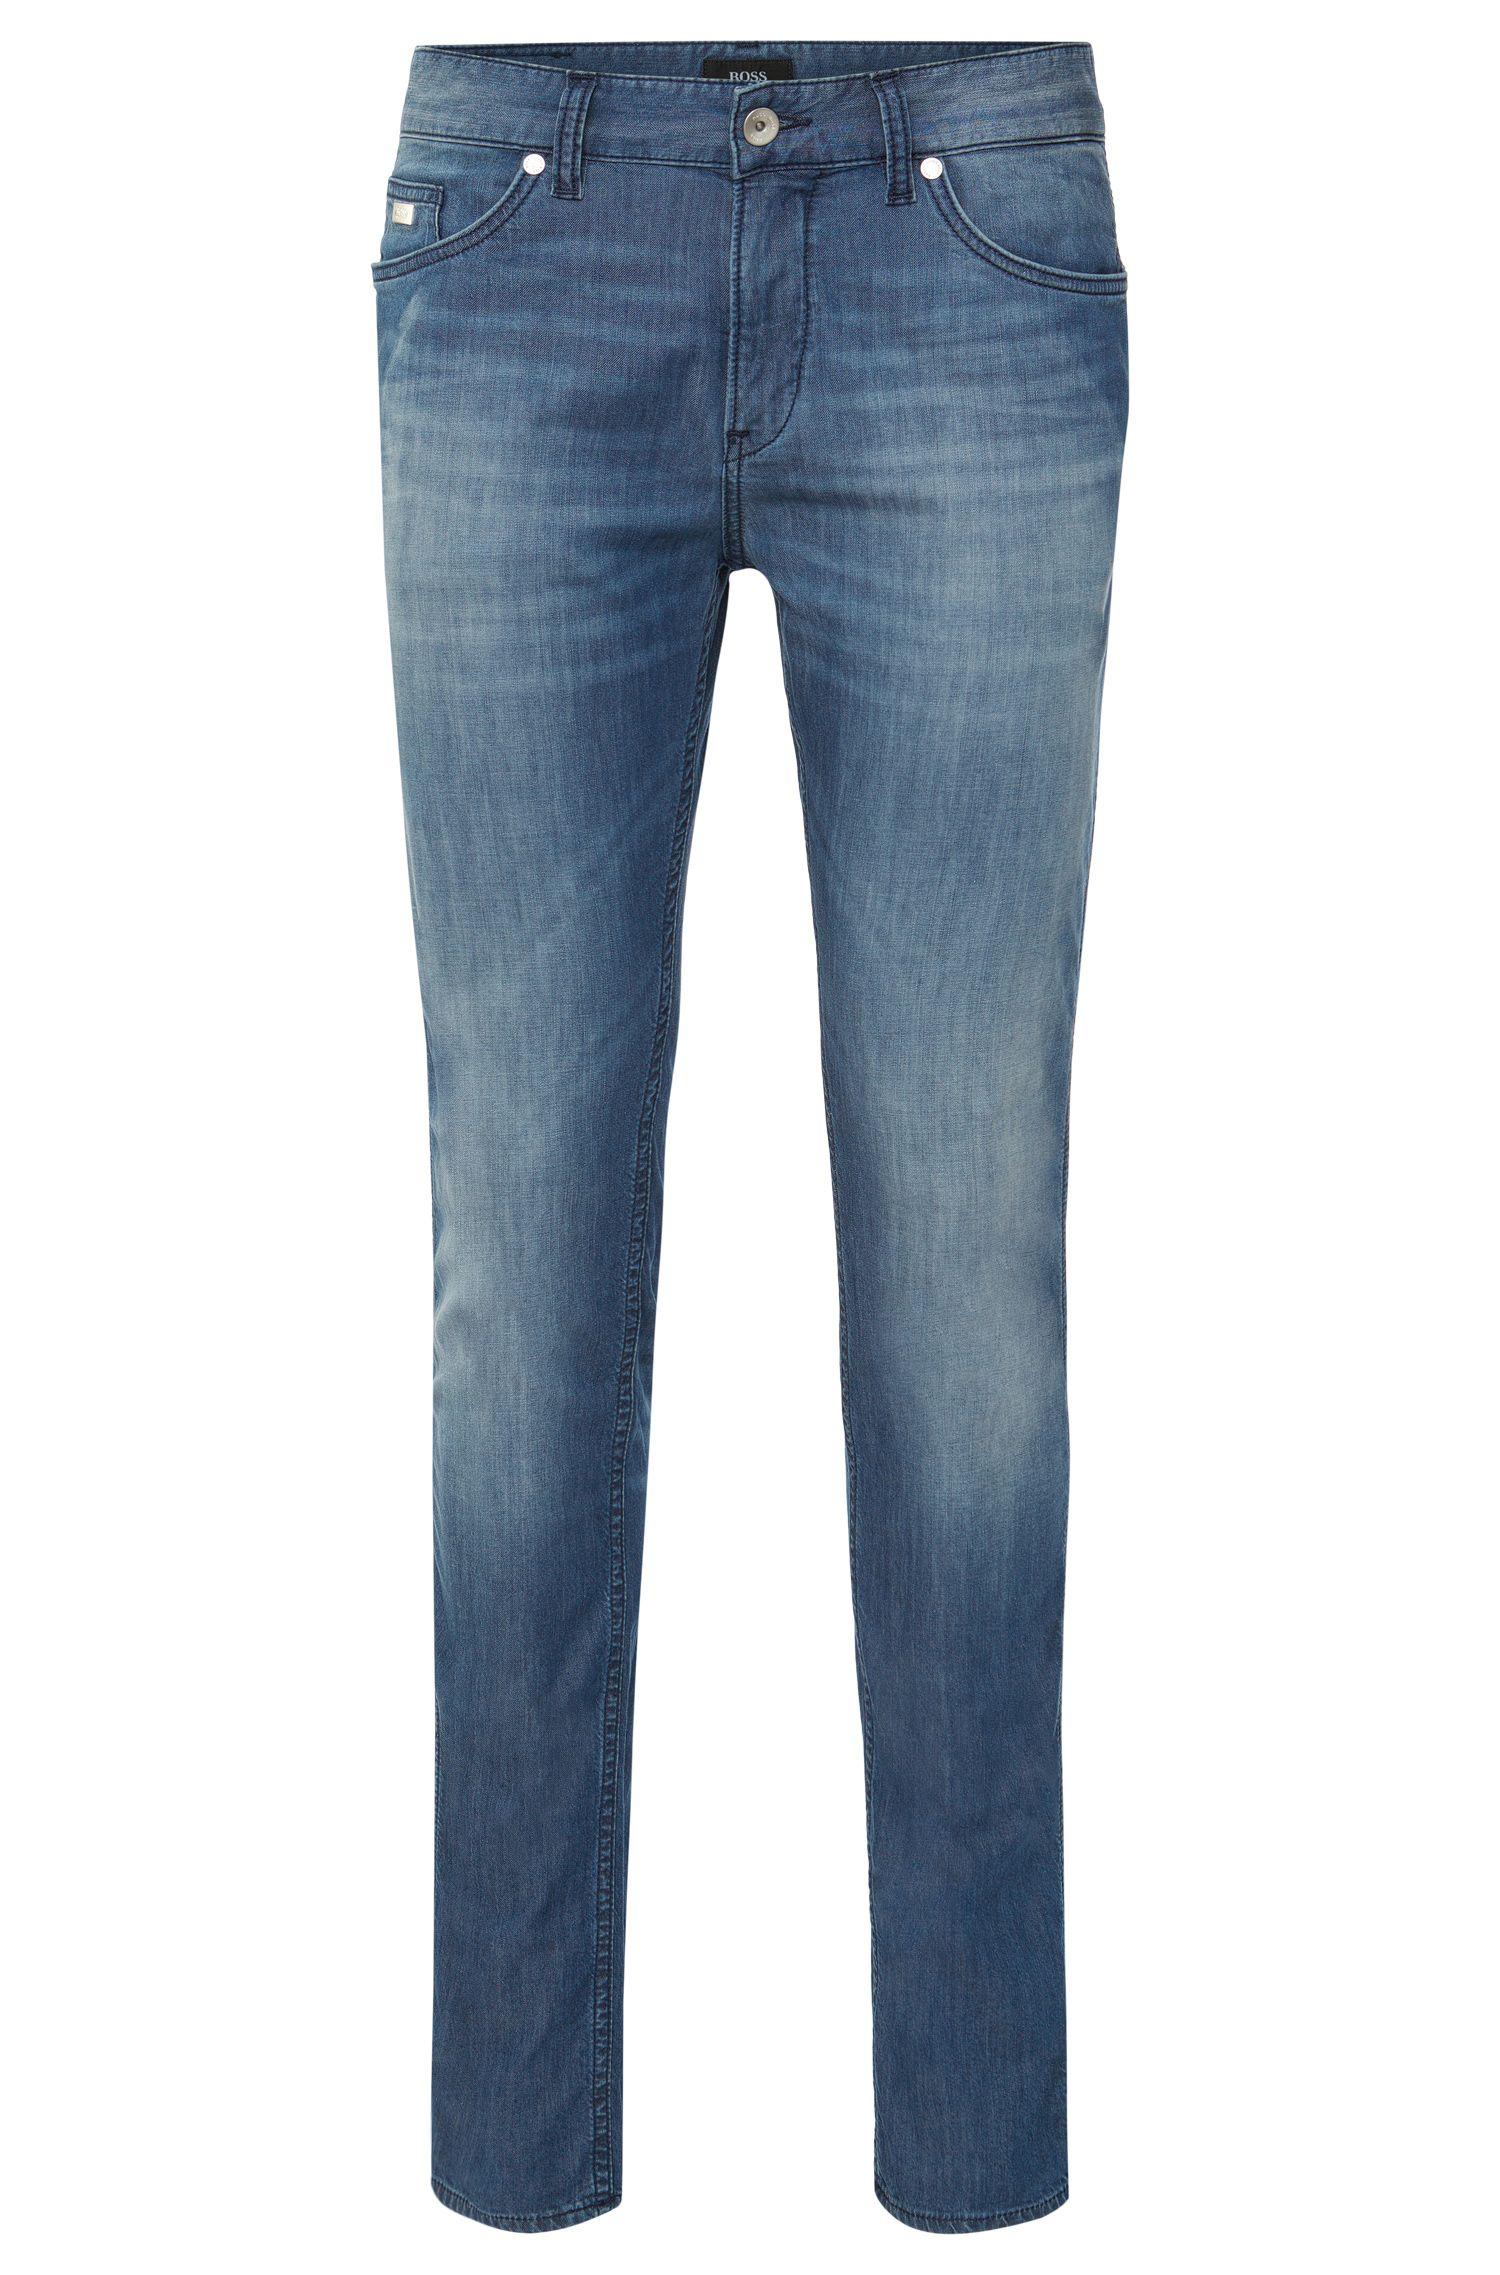 'Delaware' | Slim Fit, 6 oz Stretch Cotton Jeans